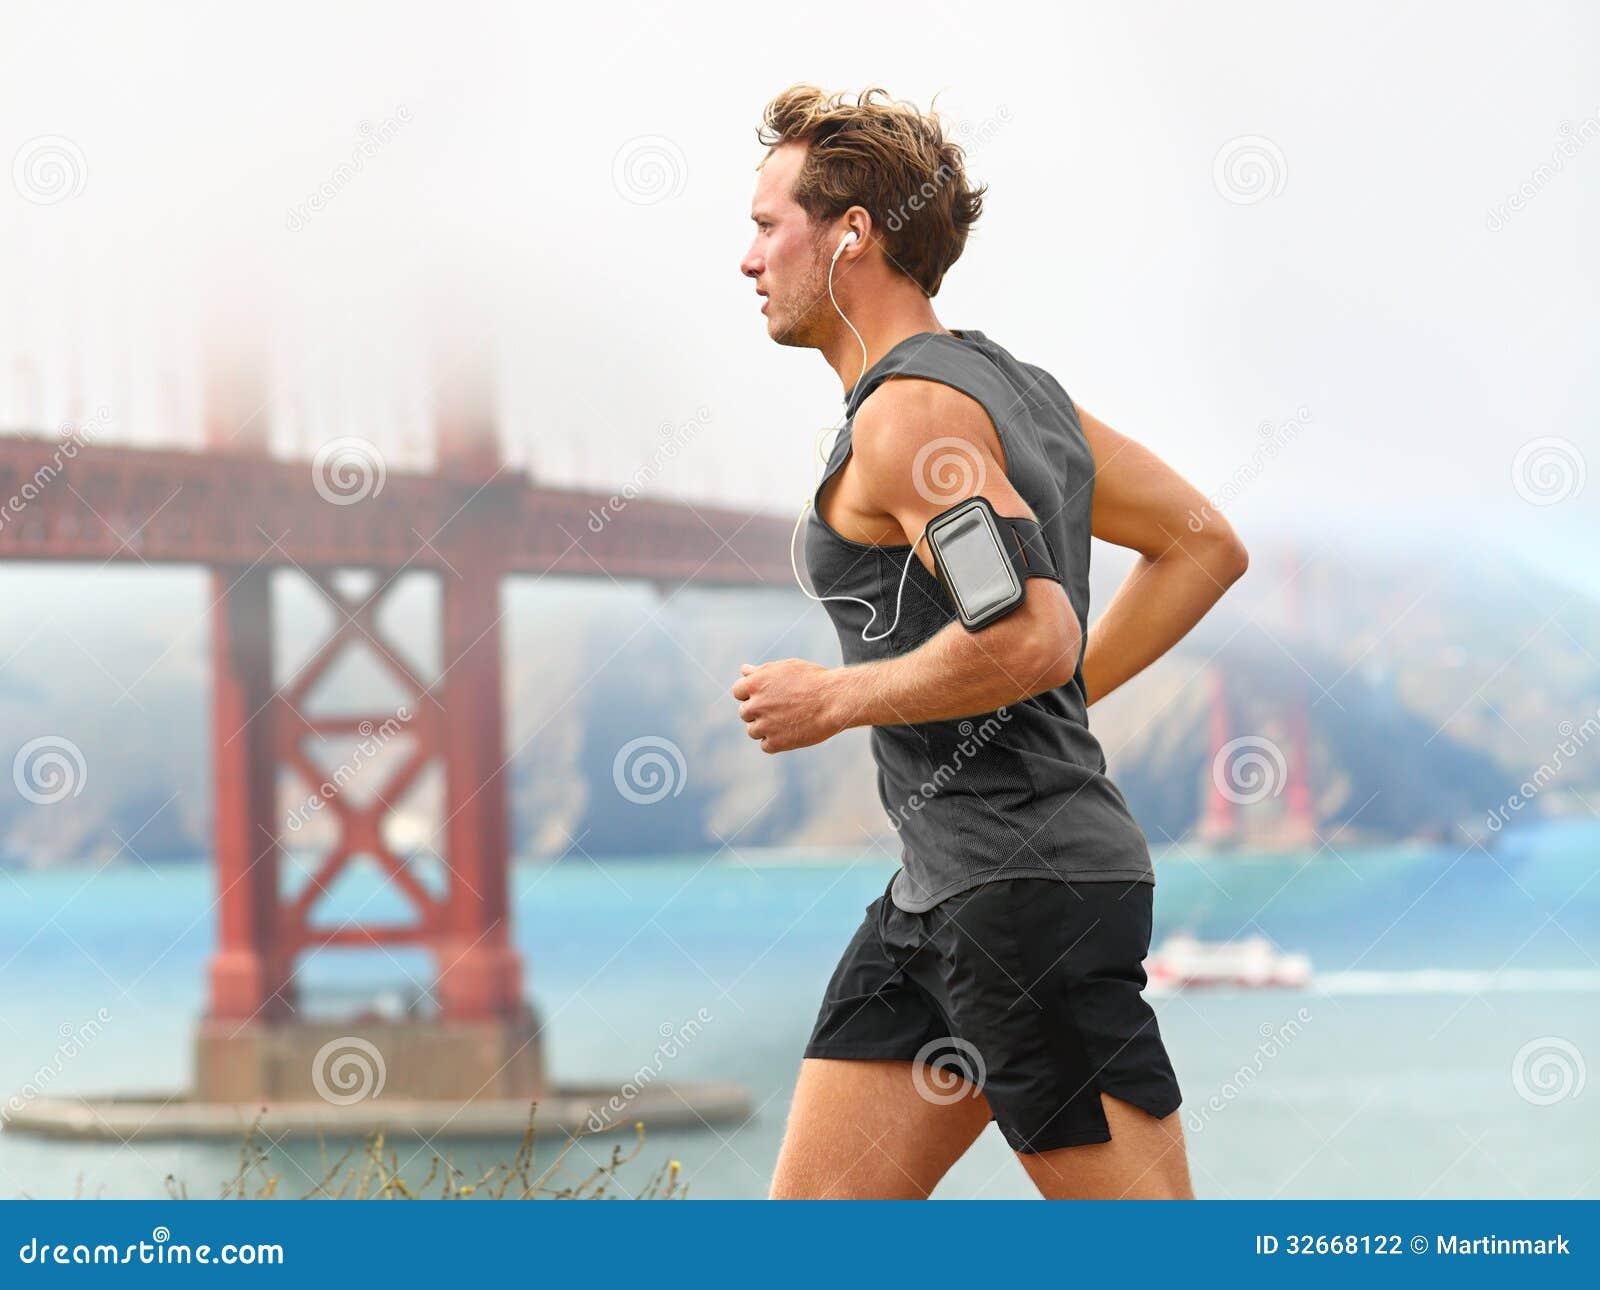 Running man - male runner in San Francisco